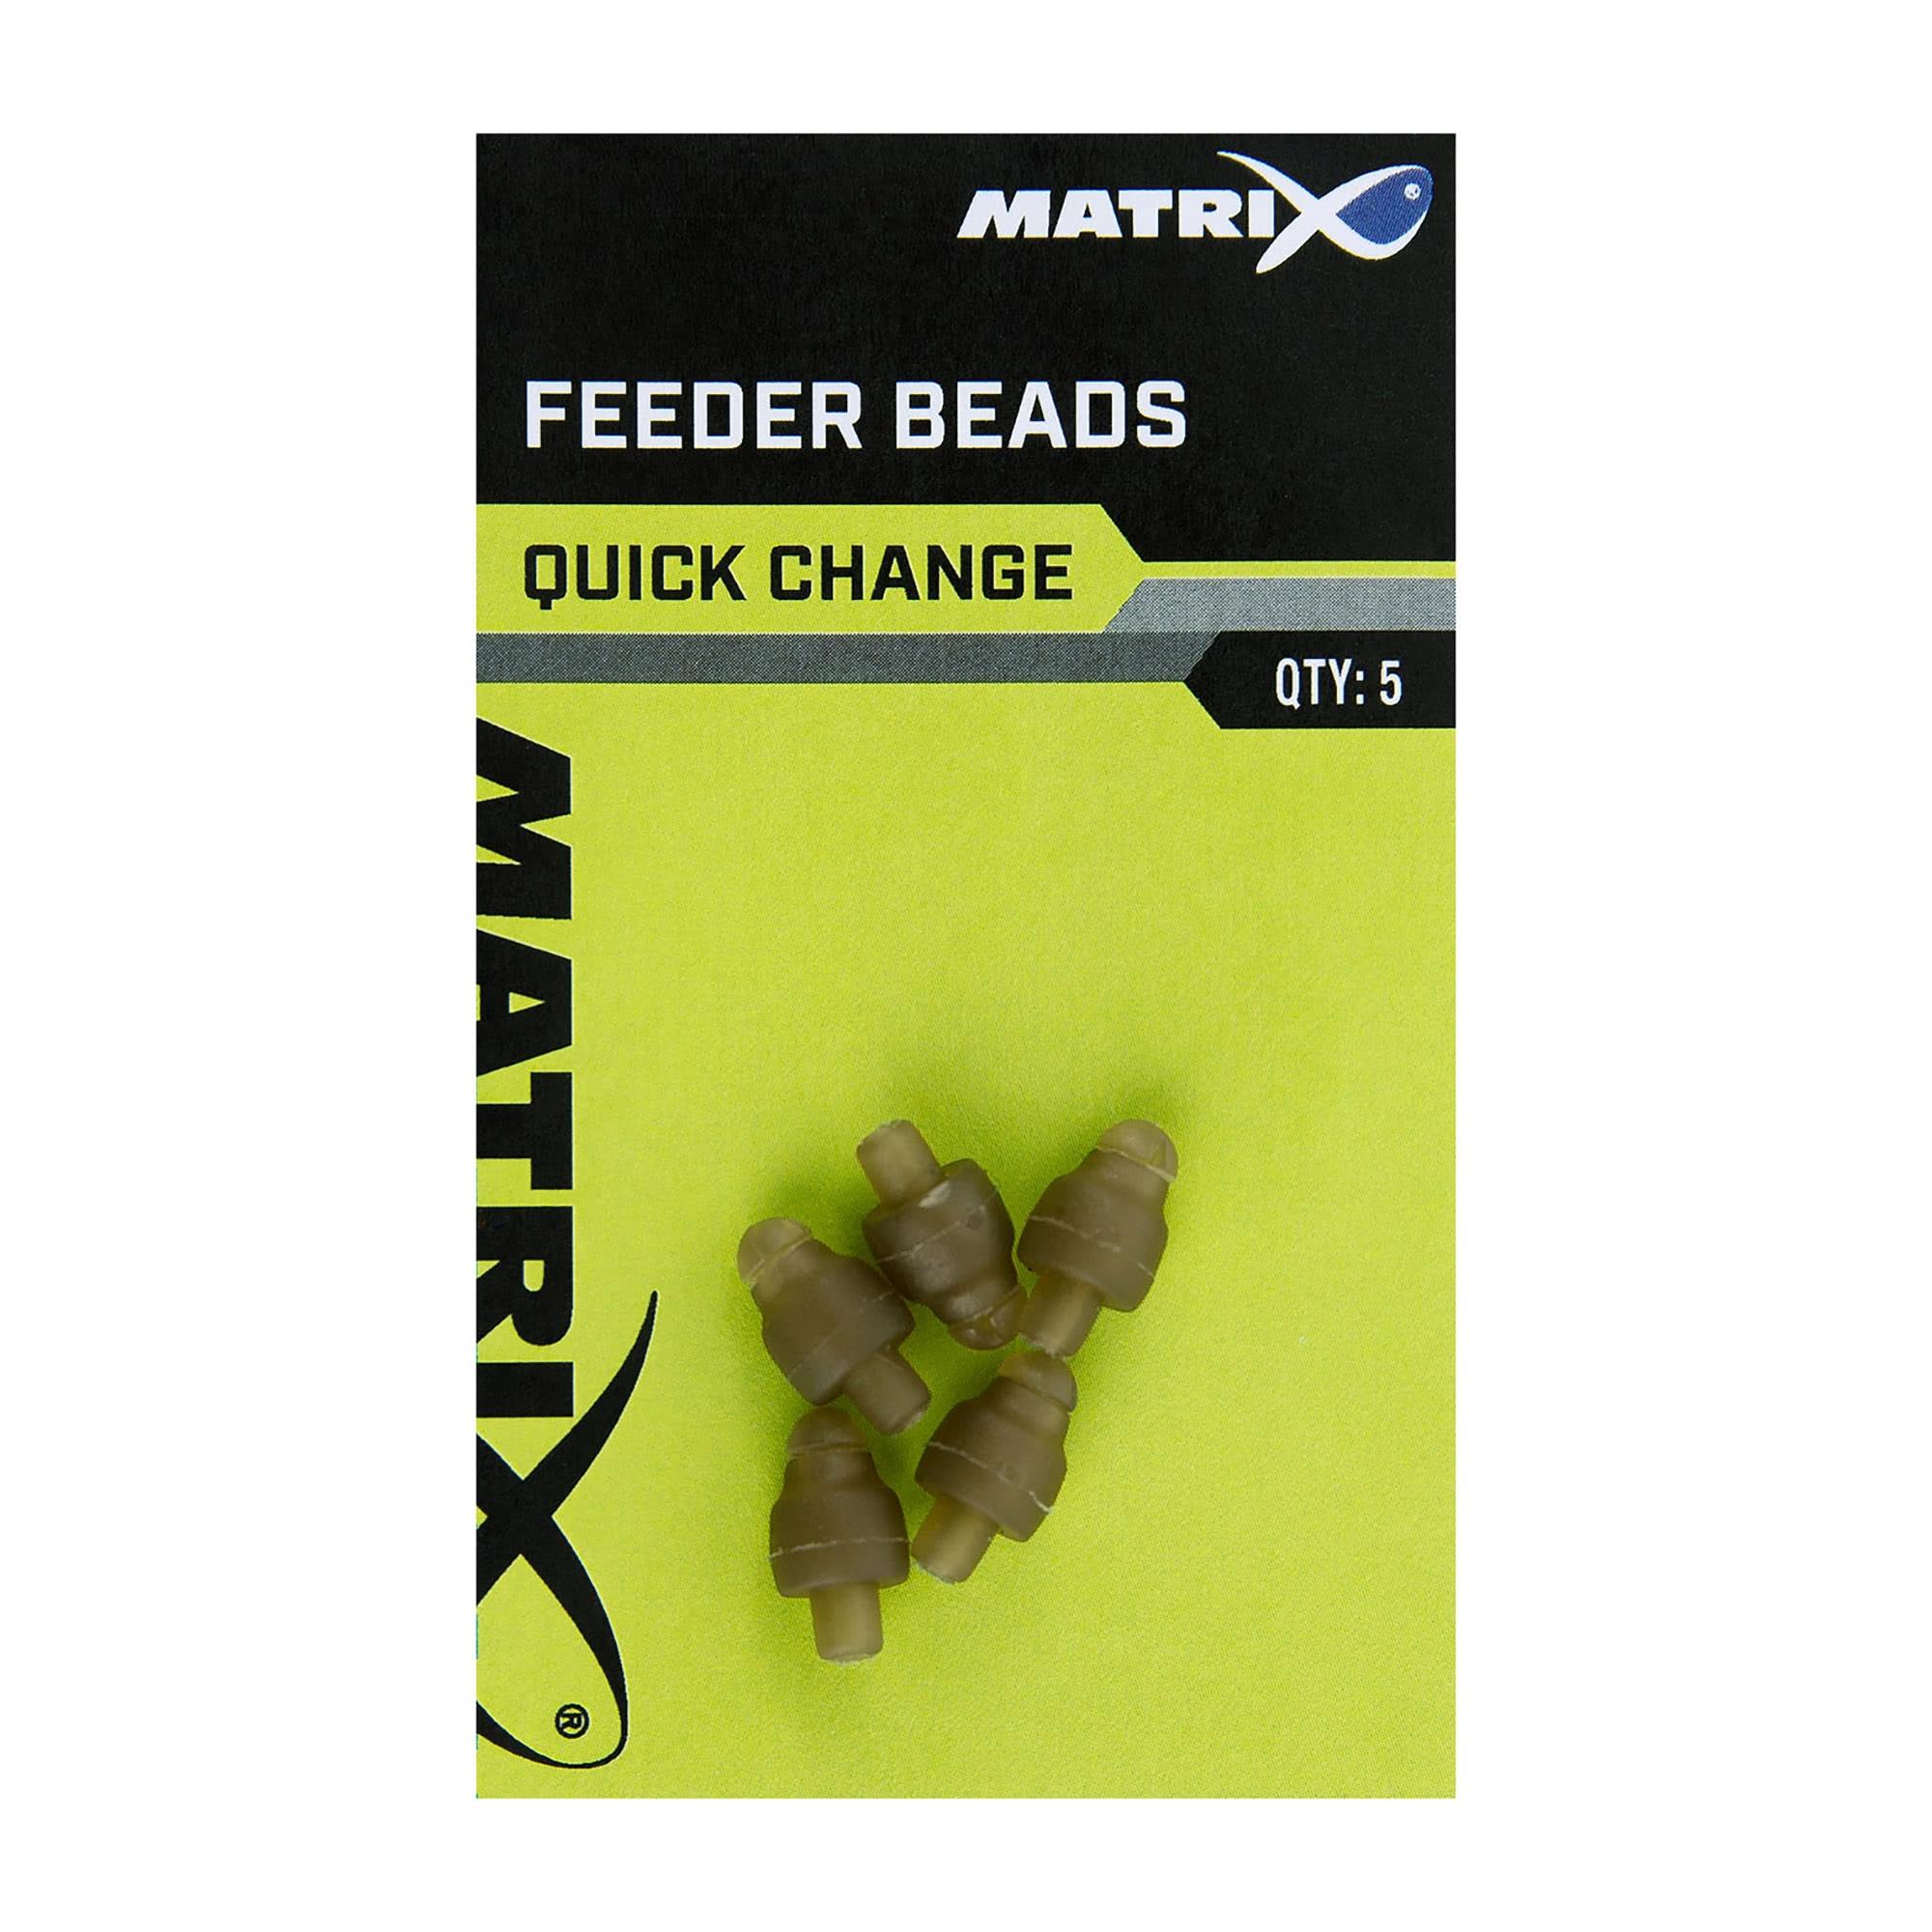 Attacco Quick Change Feeder Beads MATRIX